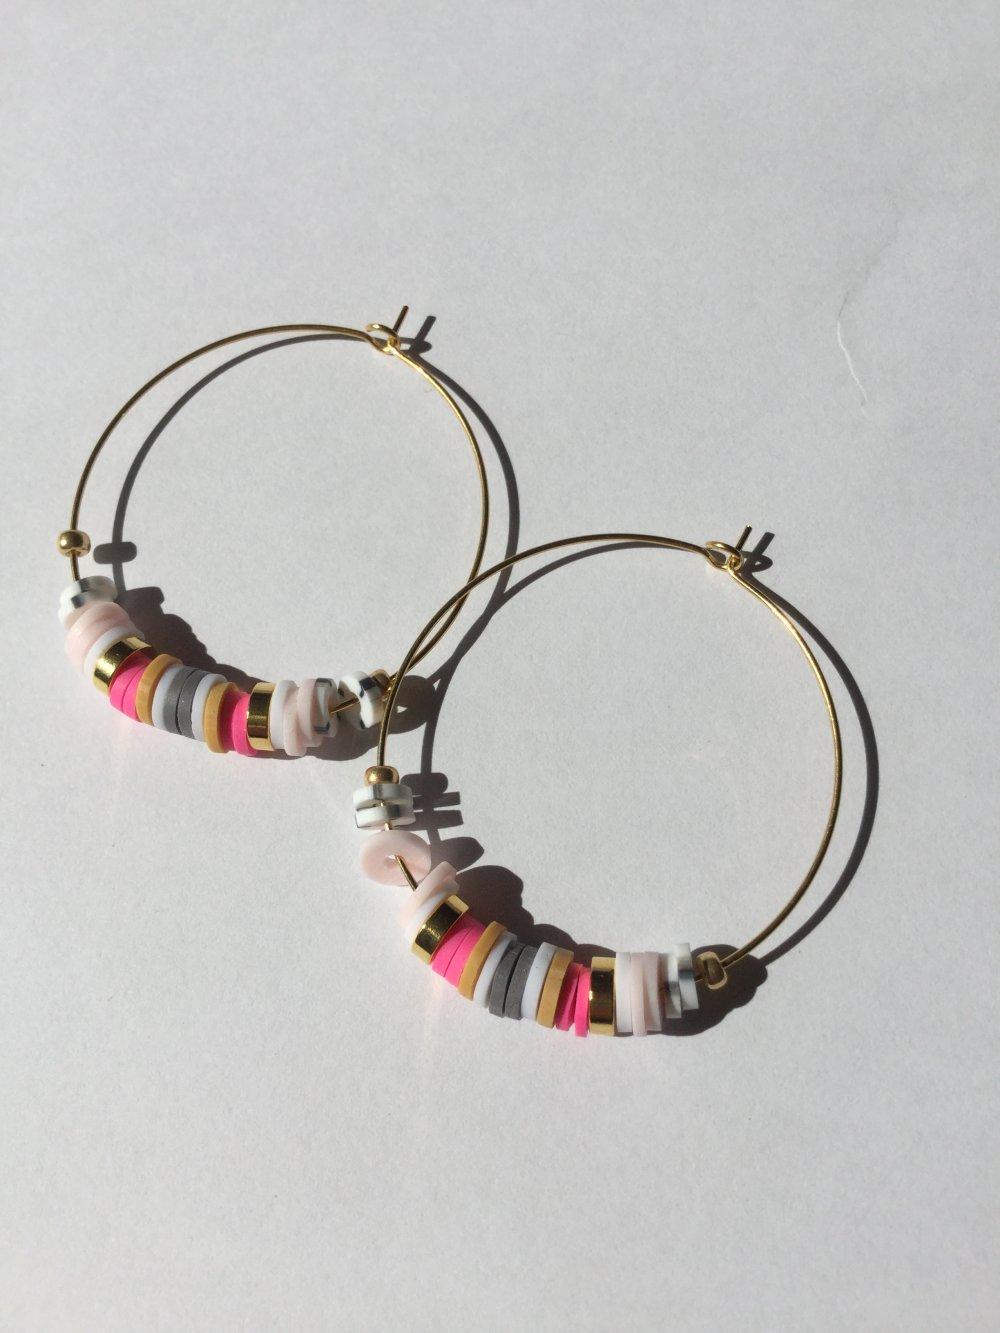 Créoles perles Heishi, boucles d'oreilles dorées, perles heishi